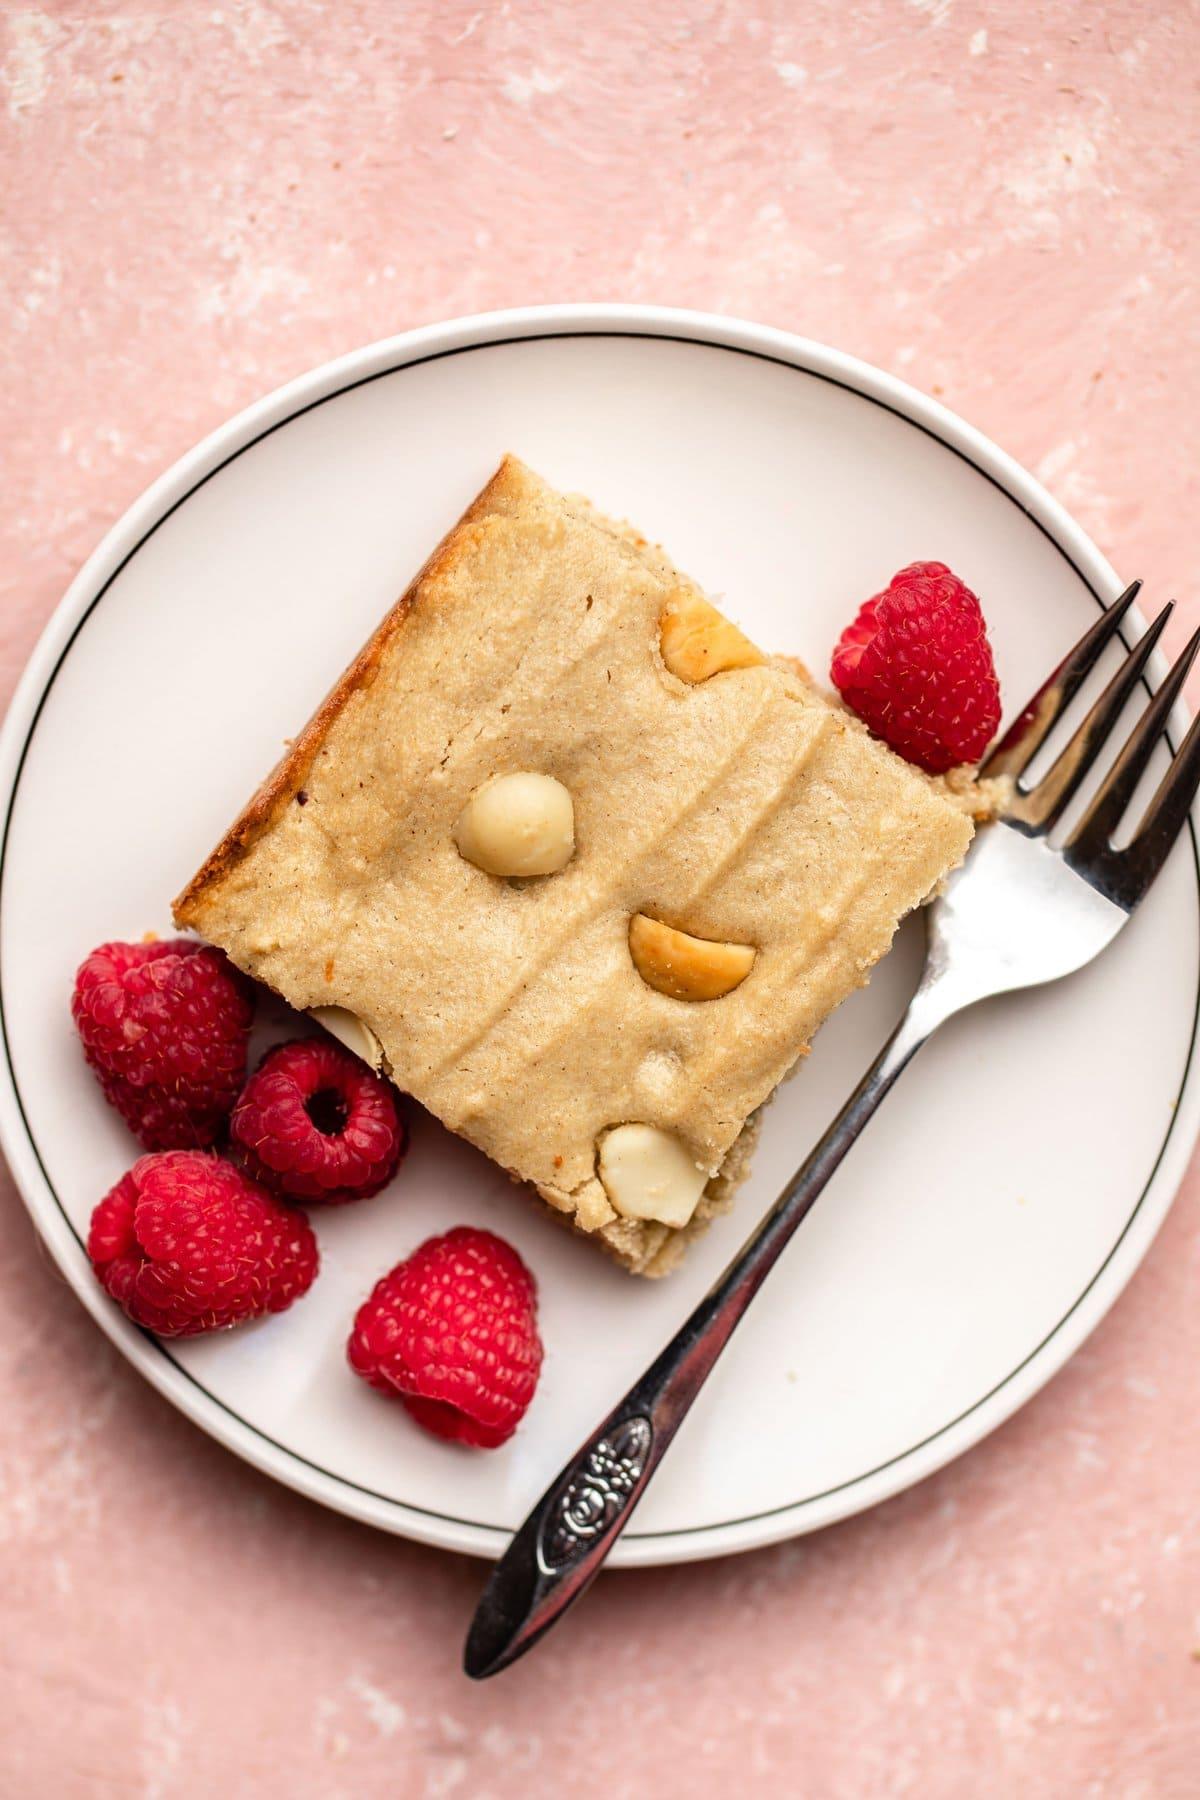 slice of vegan blondie on white plate with raspberries and fork